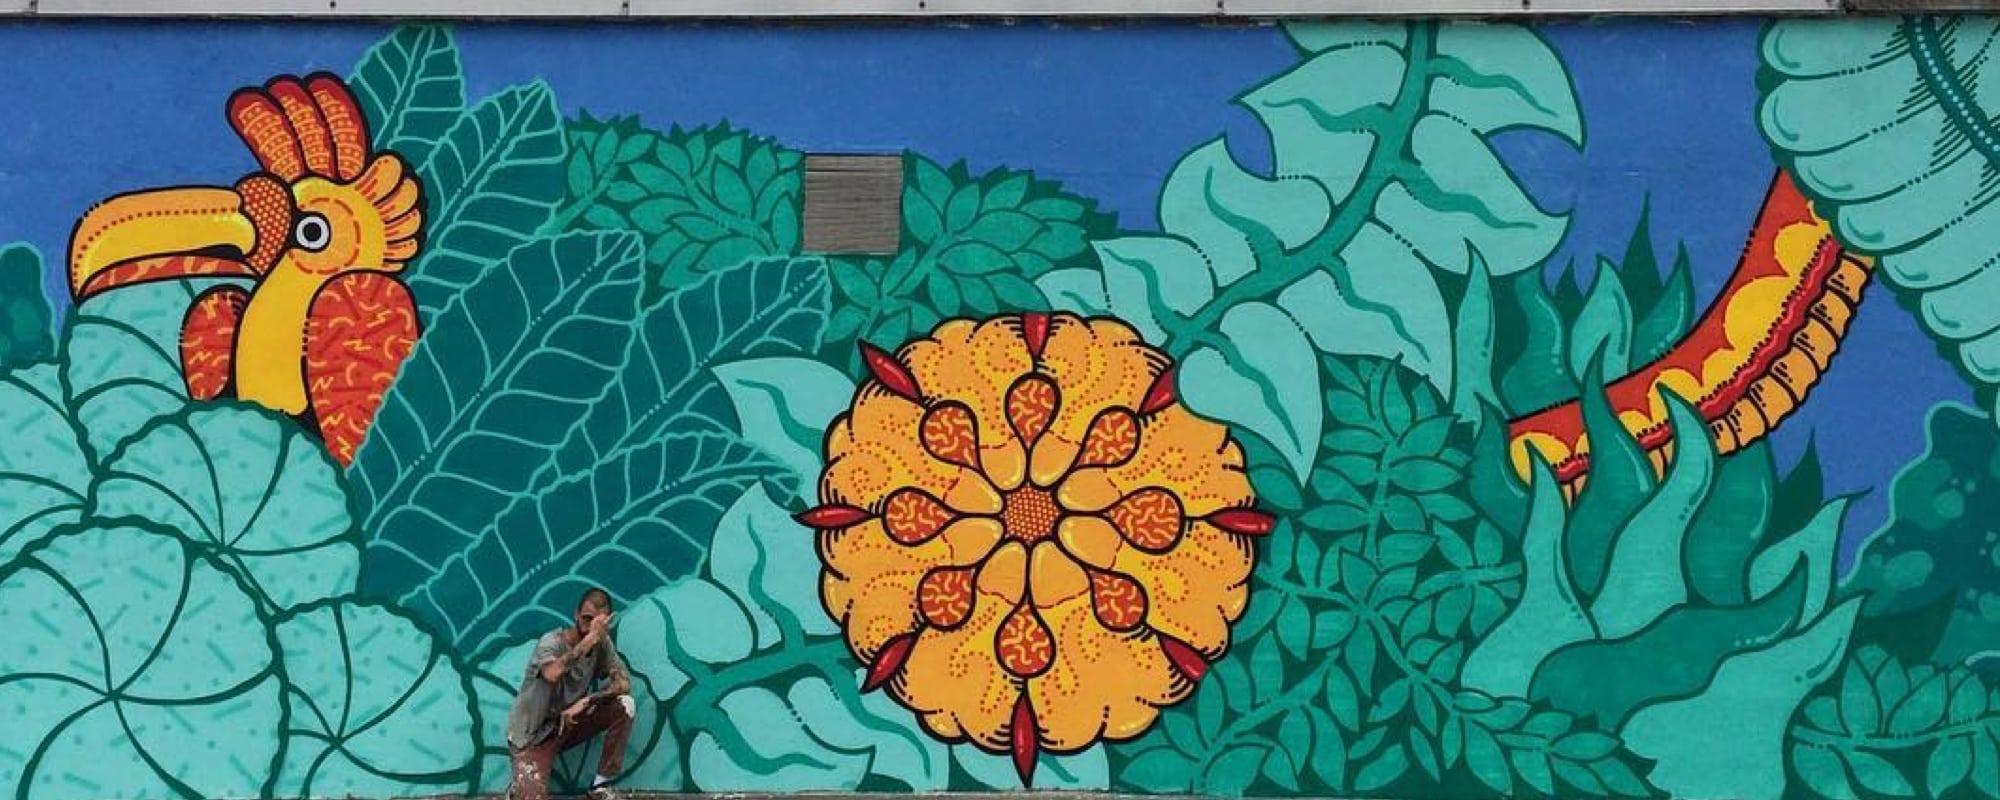 Street Artist : Dalas